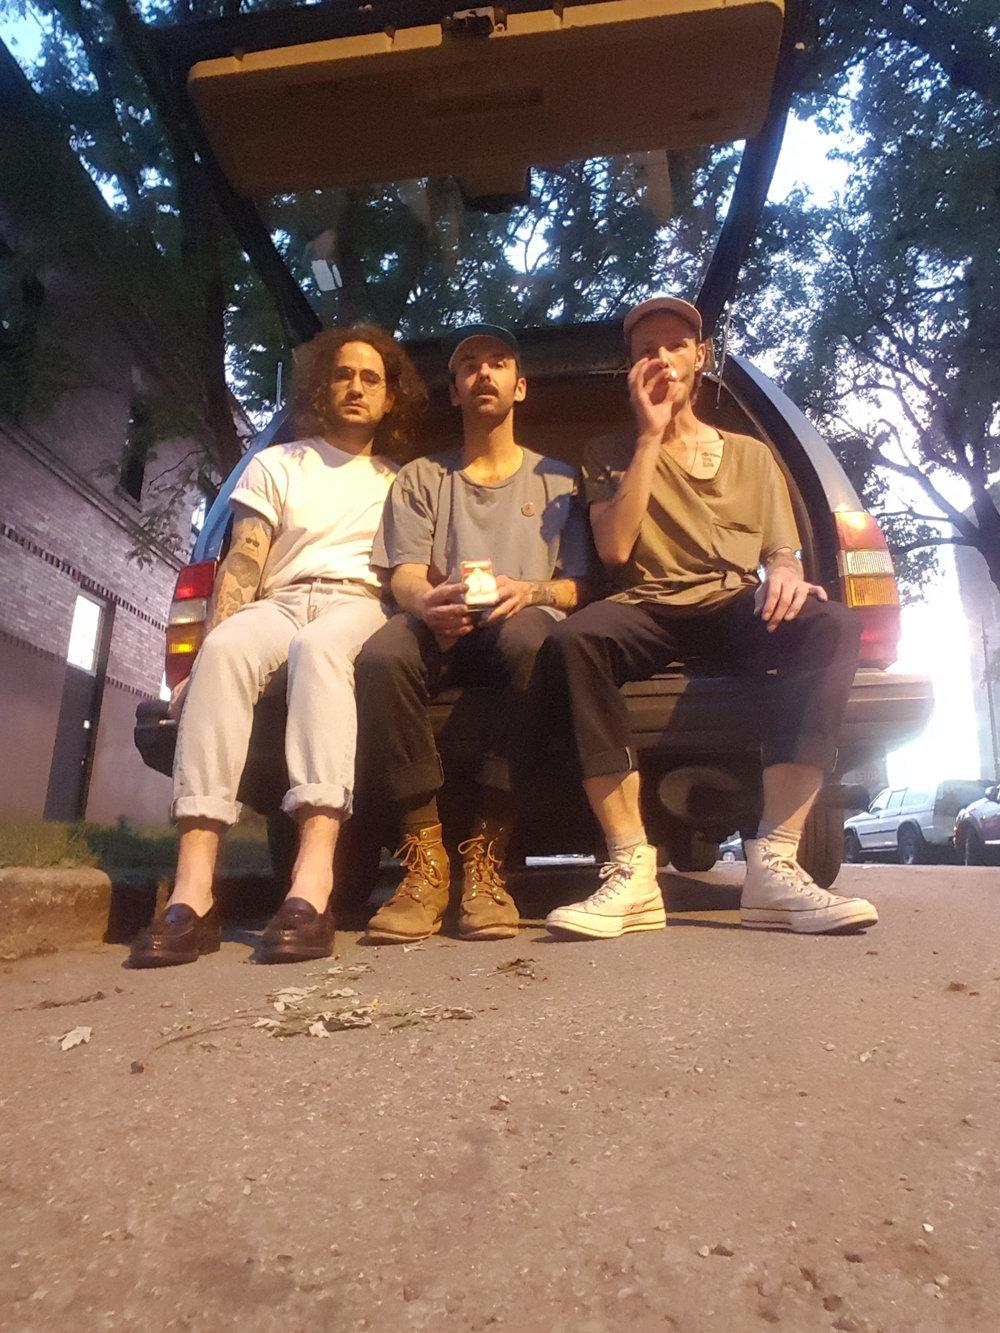 Justin Vittori, Tyler Bixby and Trey